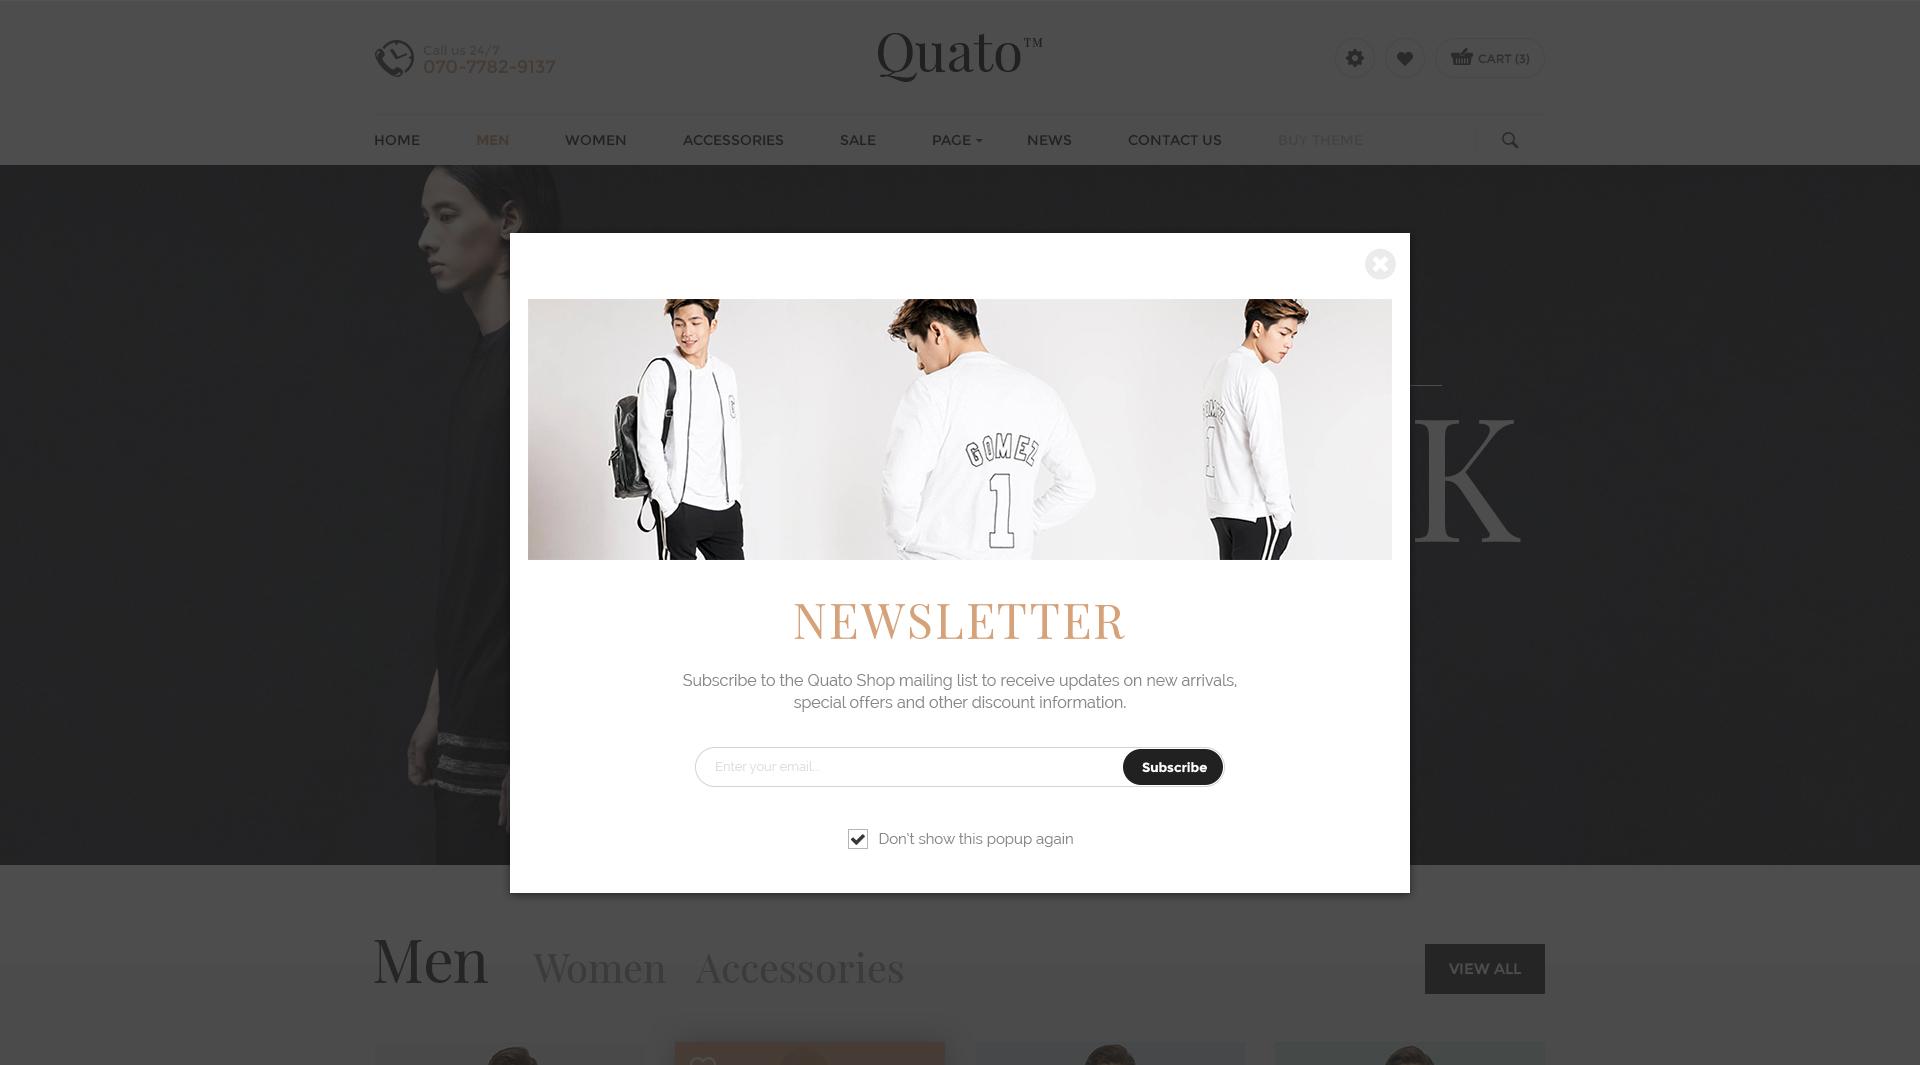 Quato fashion ecommerce psd template by engocreative themeforest quato fashion ecommerce psd template maxwellsz